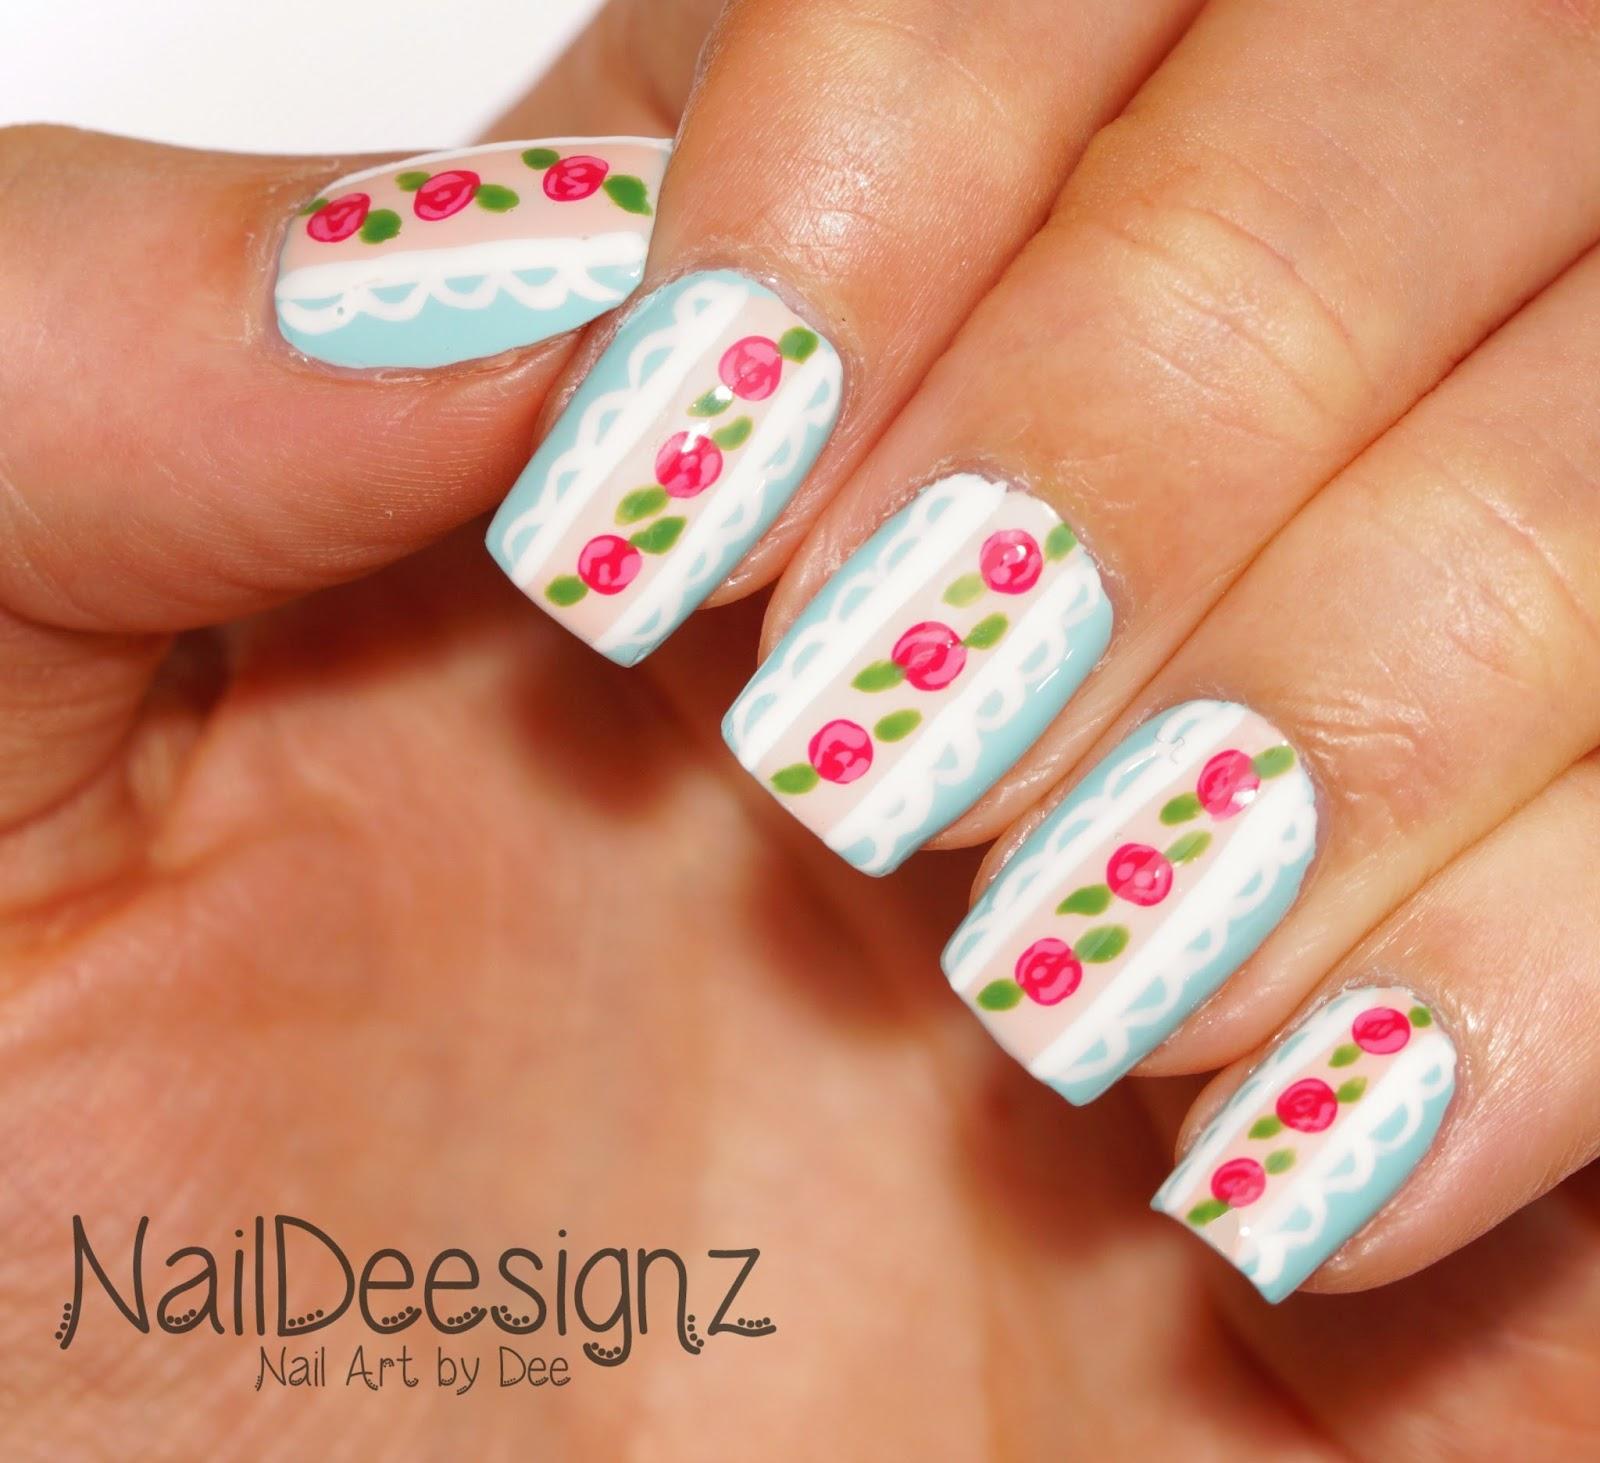 NailDeesignz: Shabby Chic Lace Nail Art